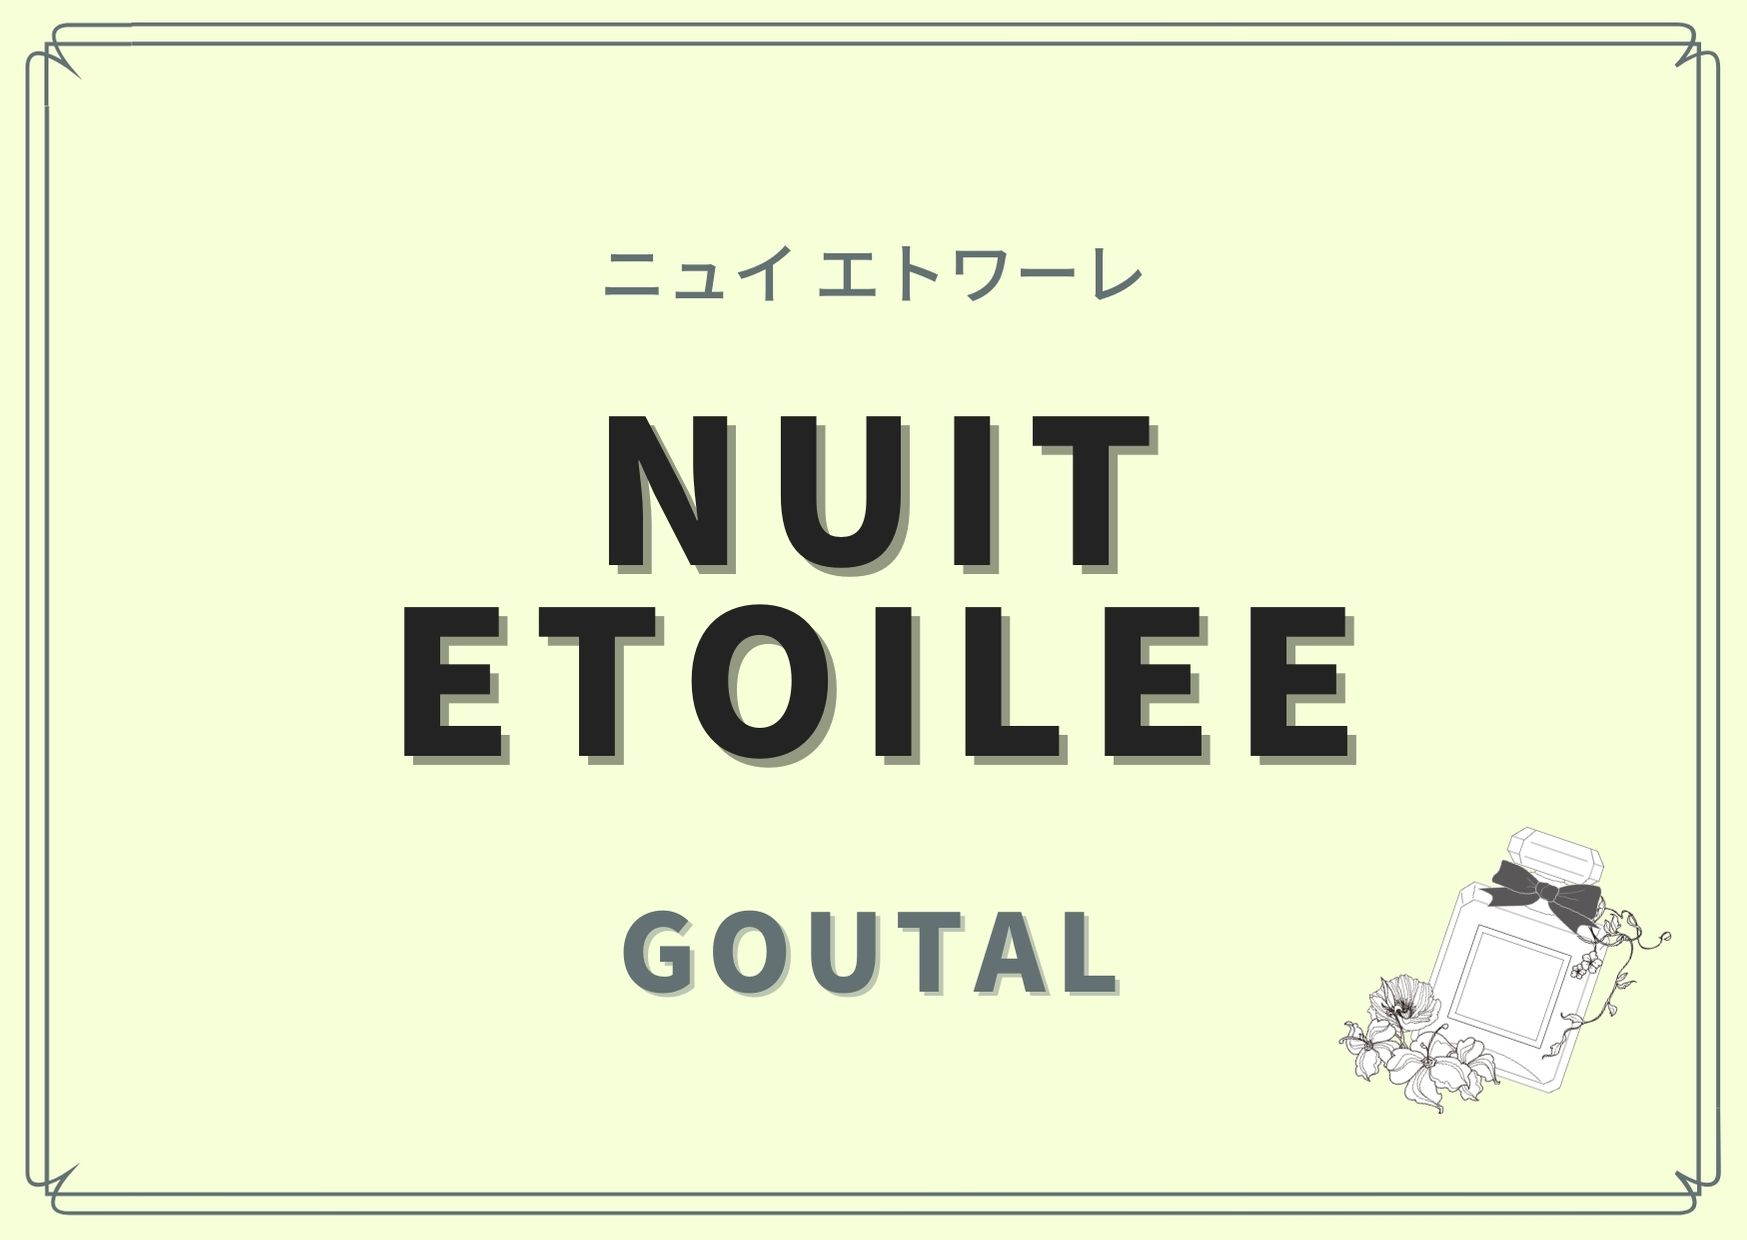 Nuit Etoilee(ニュイ エトワーレ)/ANNICK GOUTAL(アニック グタール)